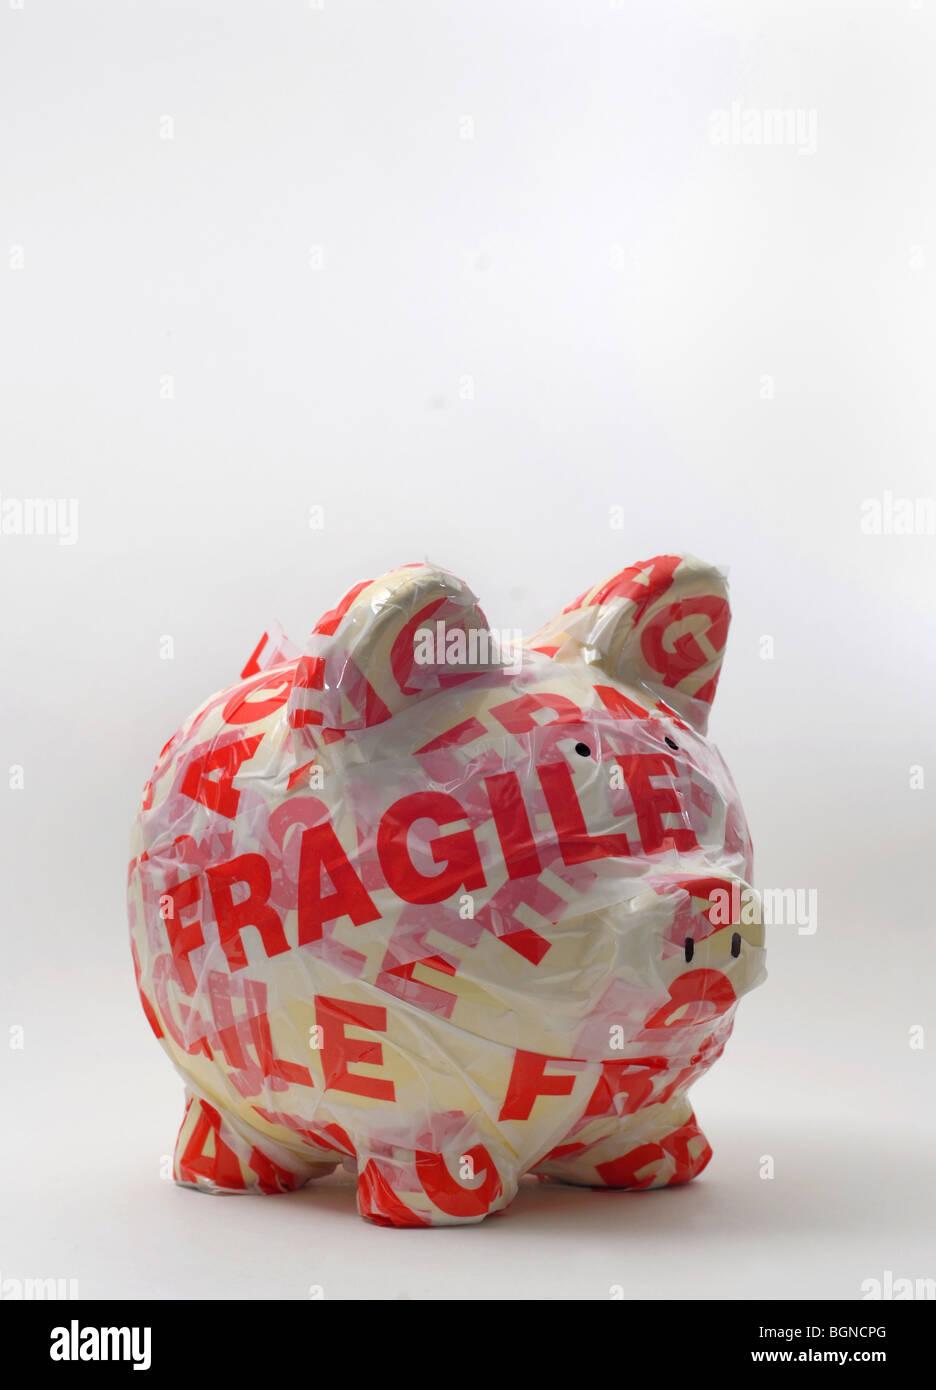 PIGGY BANK WRAPPED IN FRAGILE WARNING TAPE RE SAVINGS/INVESTMENTS/MONEY/ECONOMY/BANKS THE ECONOMY MONEY UK - Stock Image